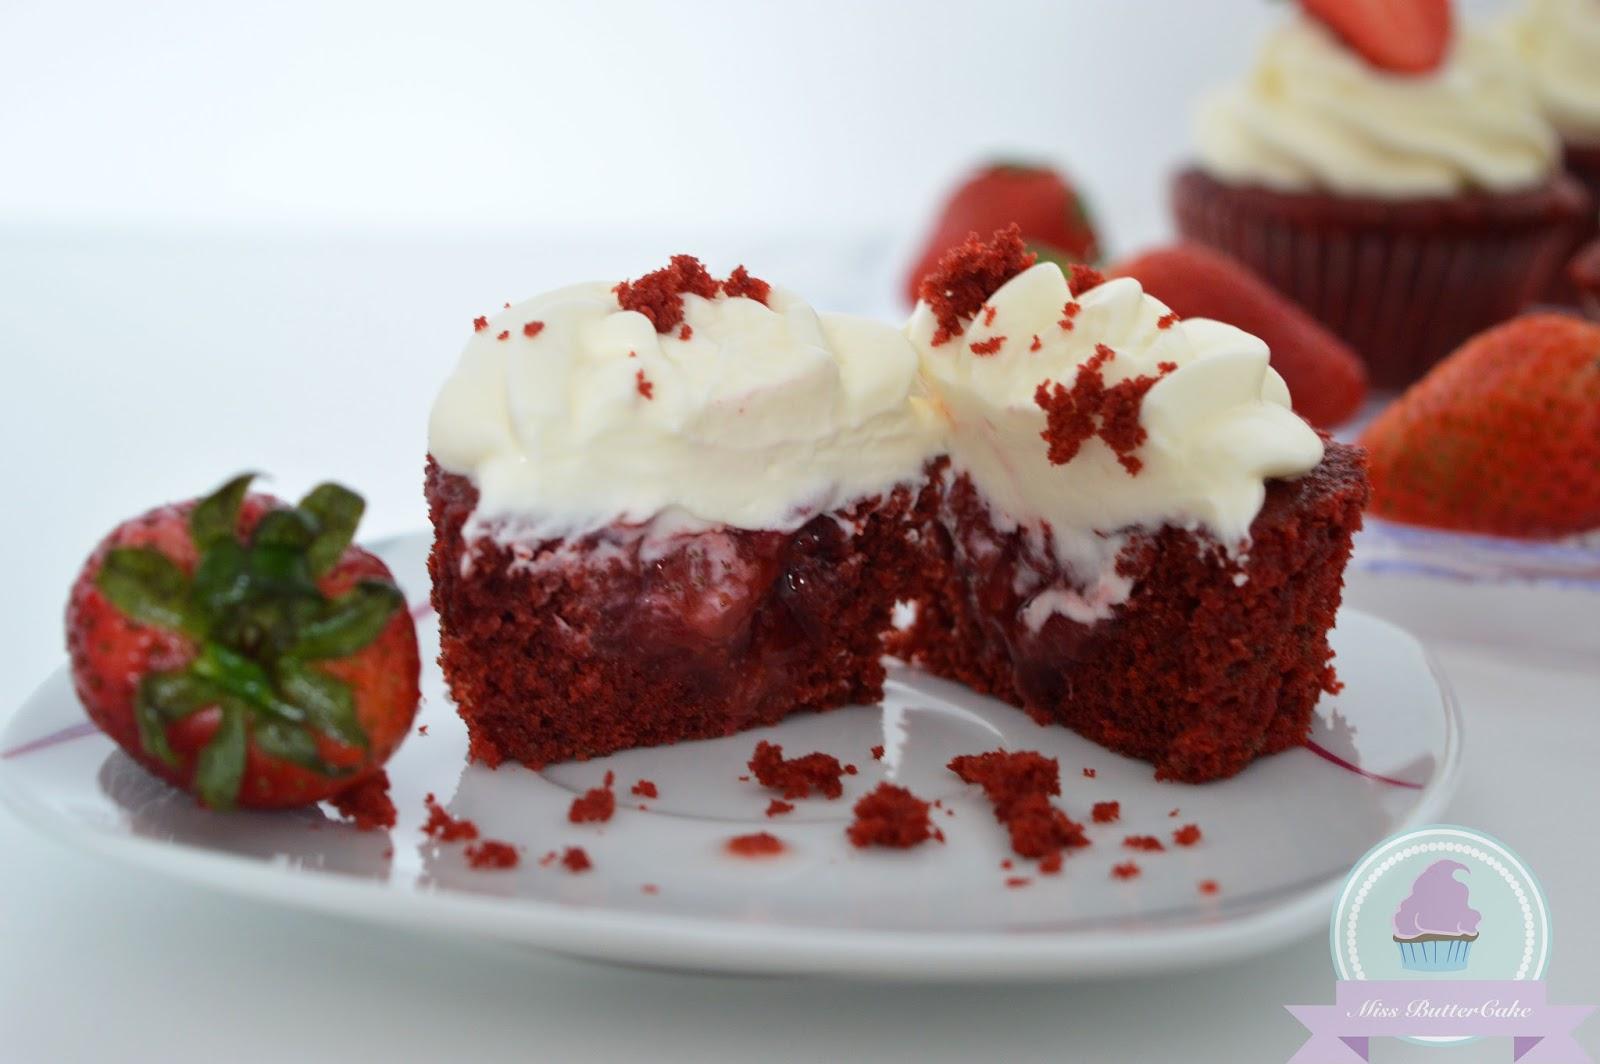 miss buttercake red velvet cupcakes mit erdbeerf llung. Black Bedroom Furniture Sets. Home Design Ideas